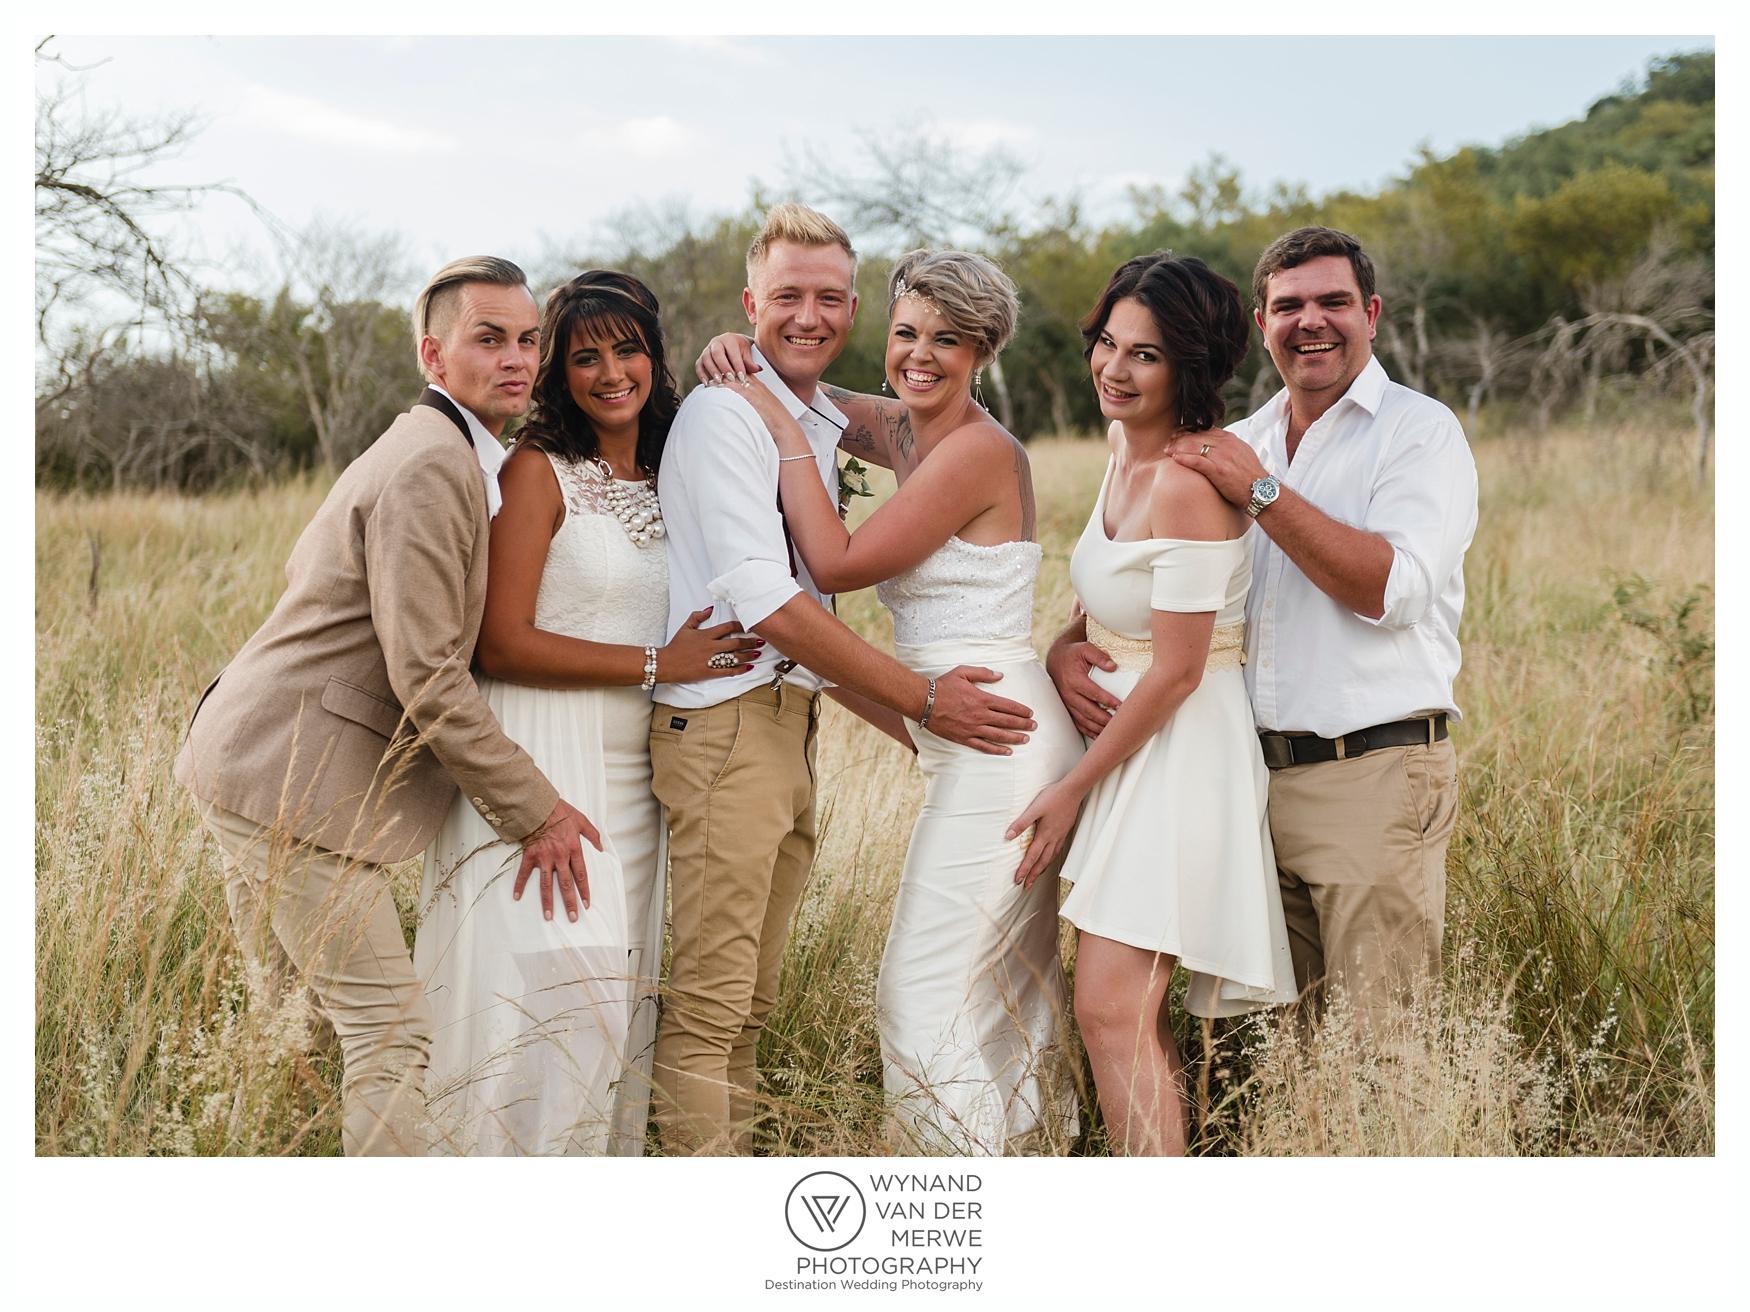 WynandvanderMerwe_weddingphotography_bushveldwedding_northam_bushveld_limpopowedding_limpopo_southafrica-176.jpg